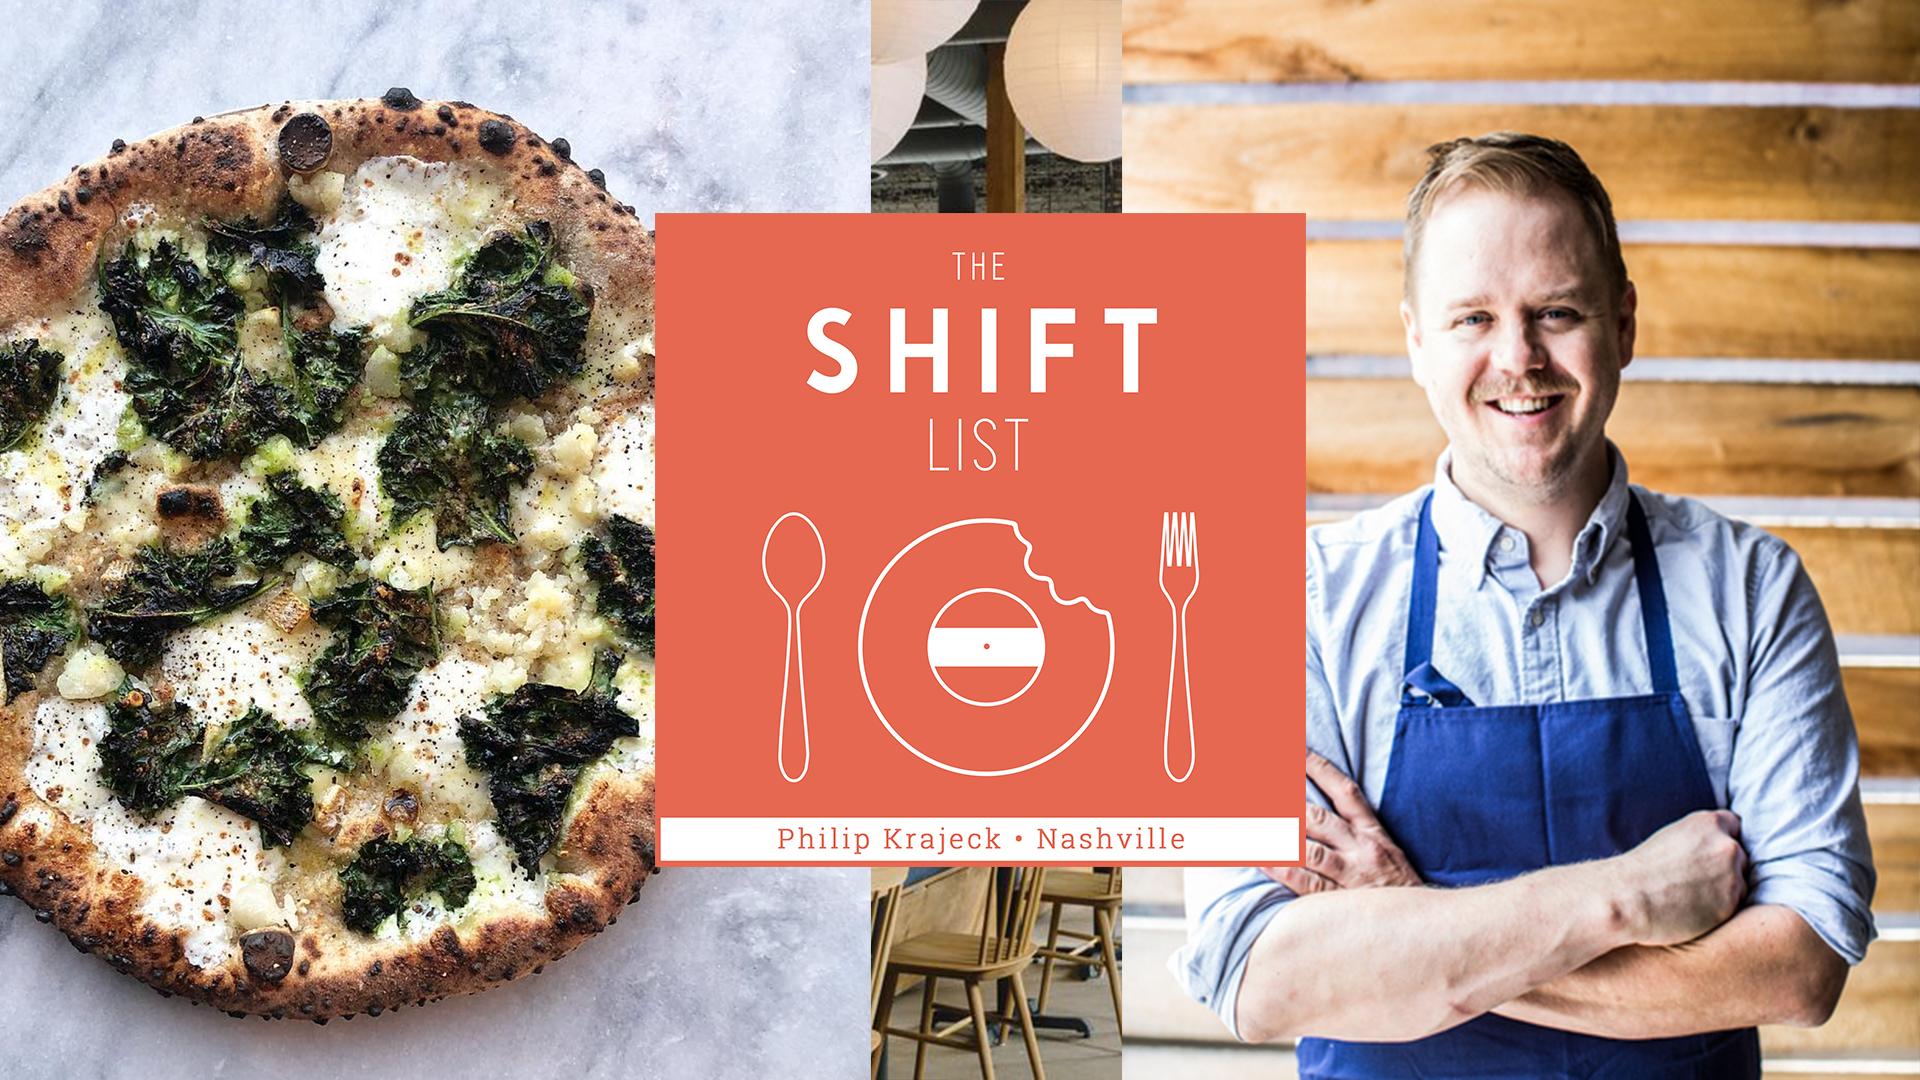 The Shift List - Philip Krajeck (Rolf & Daughters, Folk) - Nashville